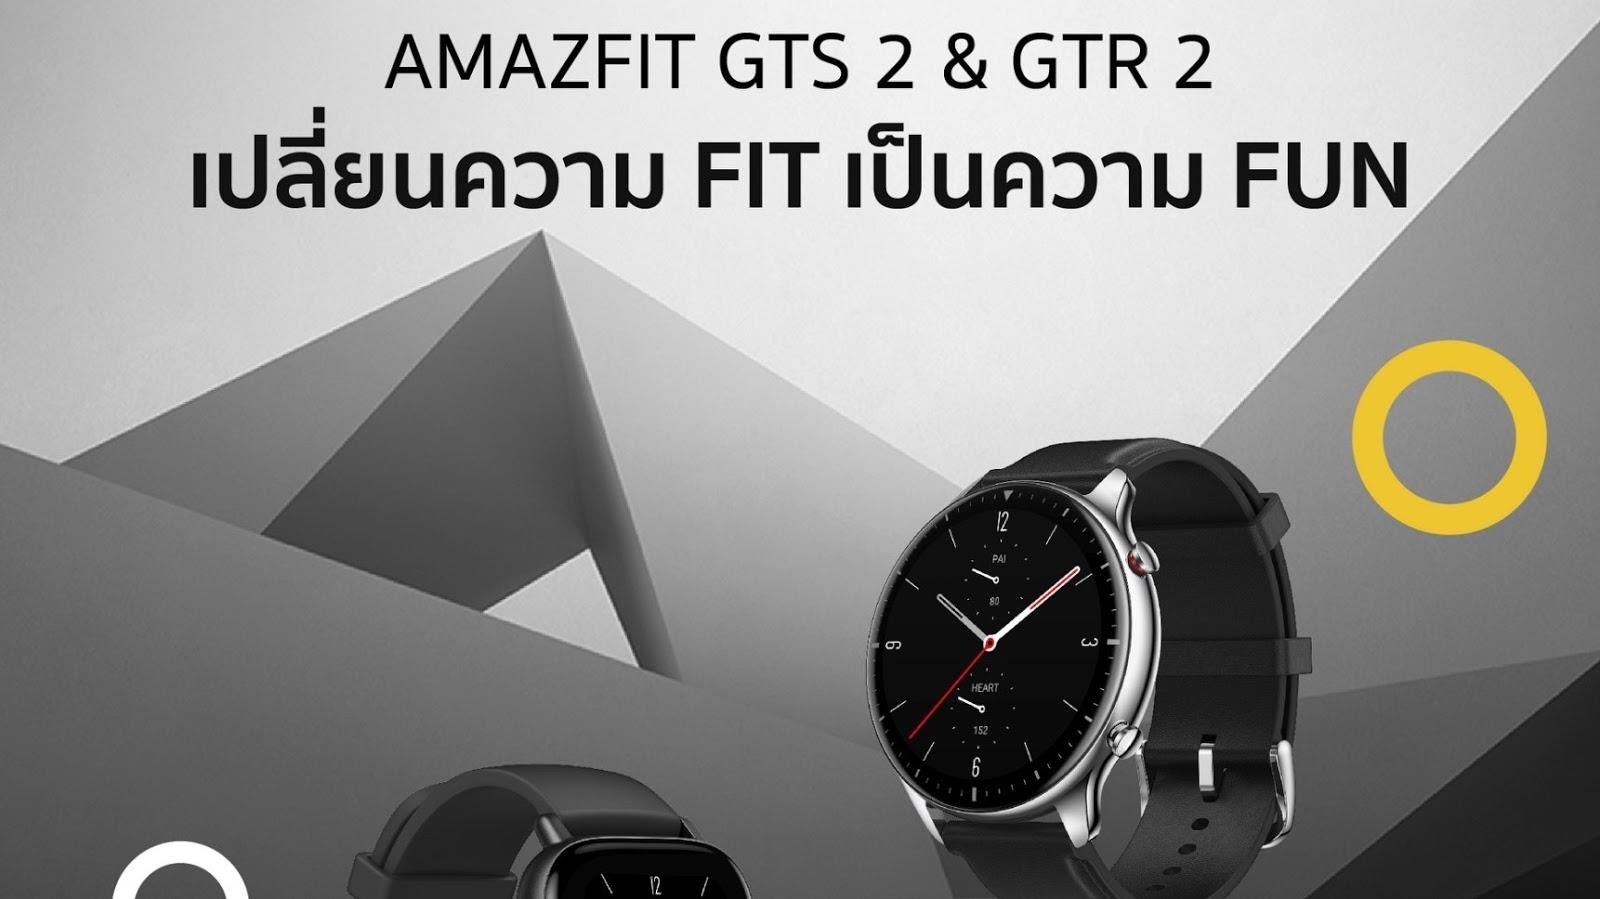 Amazfit ส่งแคมเปญลดราคาทัพสินค้าส่งท้ายปี 12.12 จัดเต็มสมาร์ทวอทช์ทั้งไลน์อัพรวมทั้ง Amazfit GTR 2 และ GTS 2 สมาร์ทวอทช์เพื่อแอ็คทีฟไลฟ์สไตล์รุ่นล่าสุด